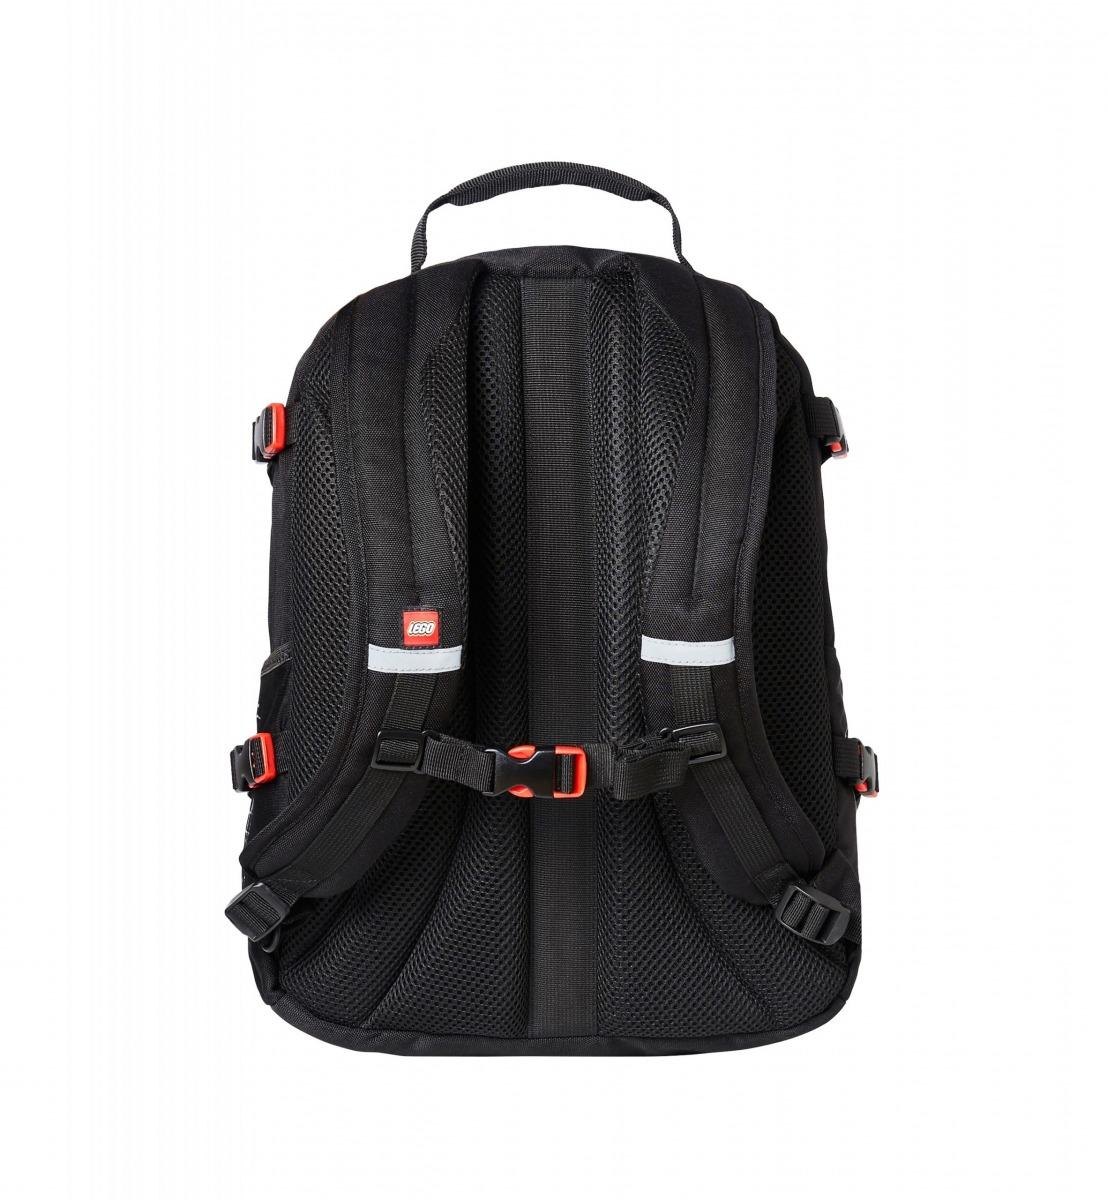 lego 5005924 mochila de minifigura para adolescentes scaled